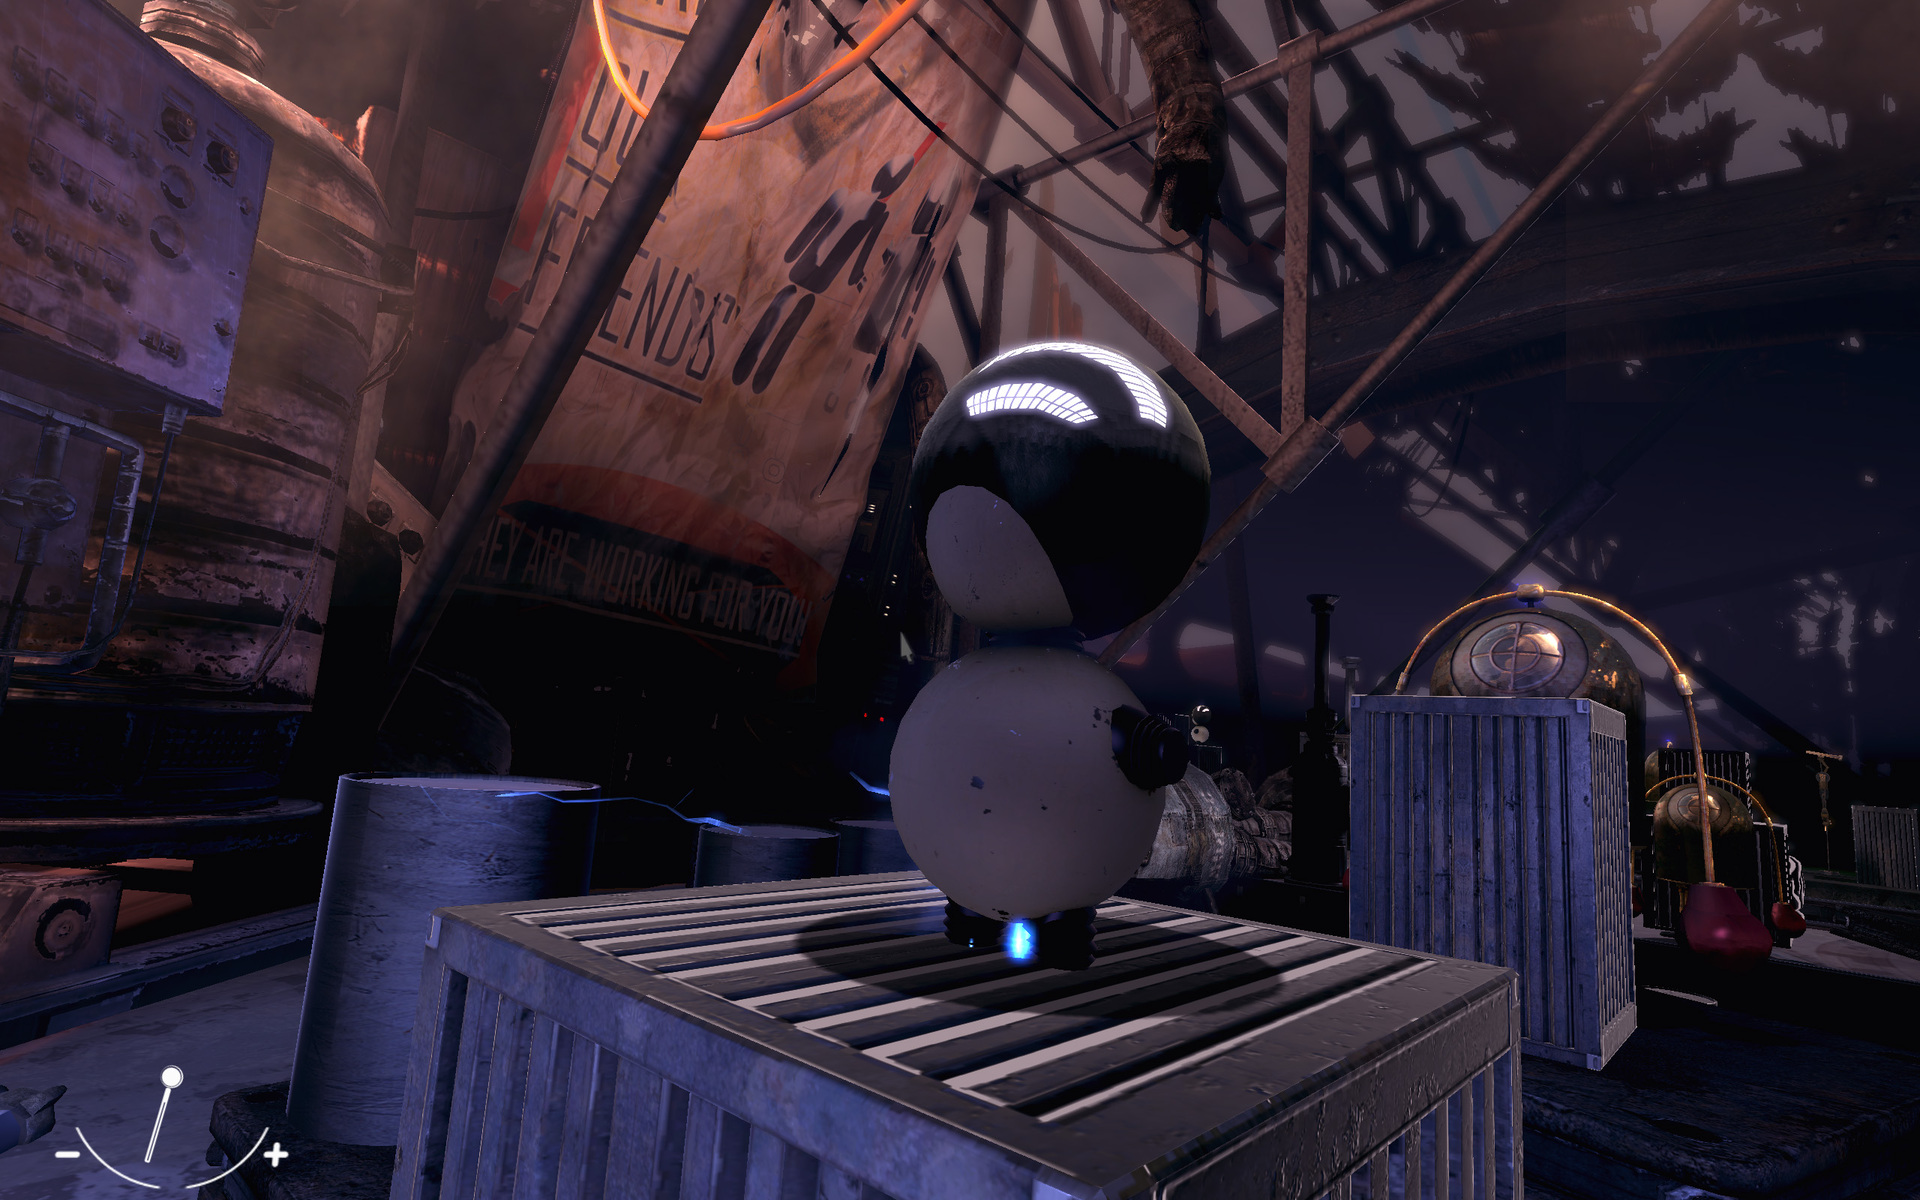 robofonics_mod_screenshot_02